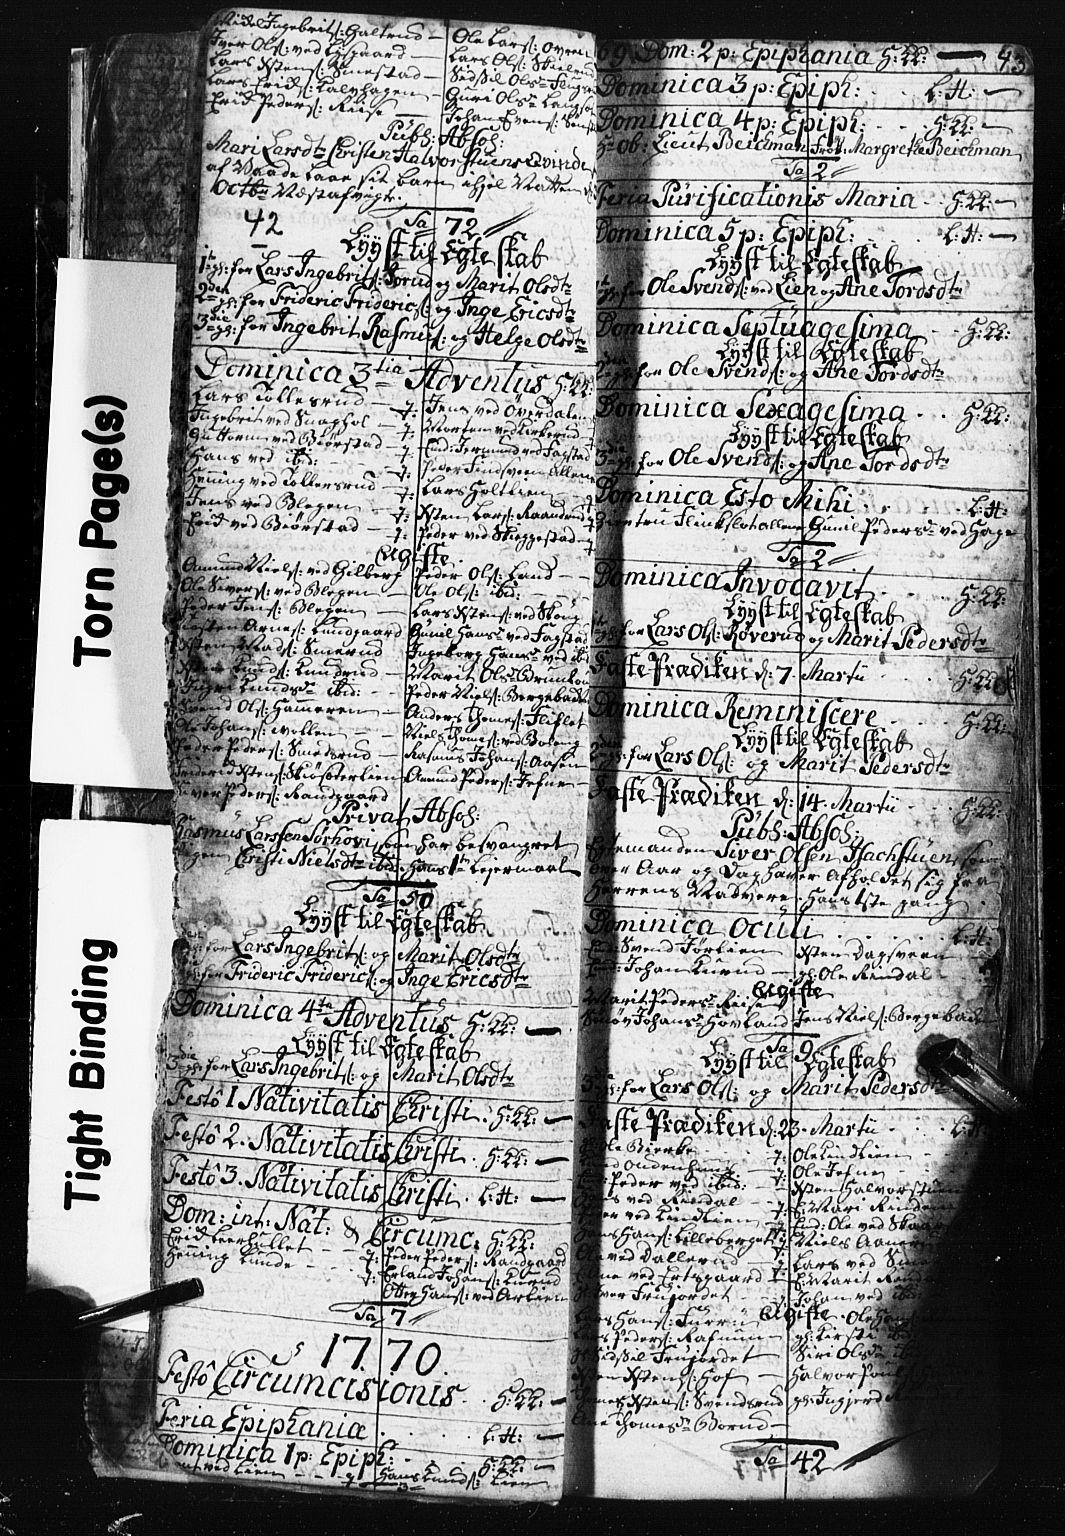 SAH, Fåberg prestekontor, Klokkerbok nr. 3, 1768-1796, s. 42-43